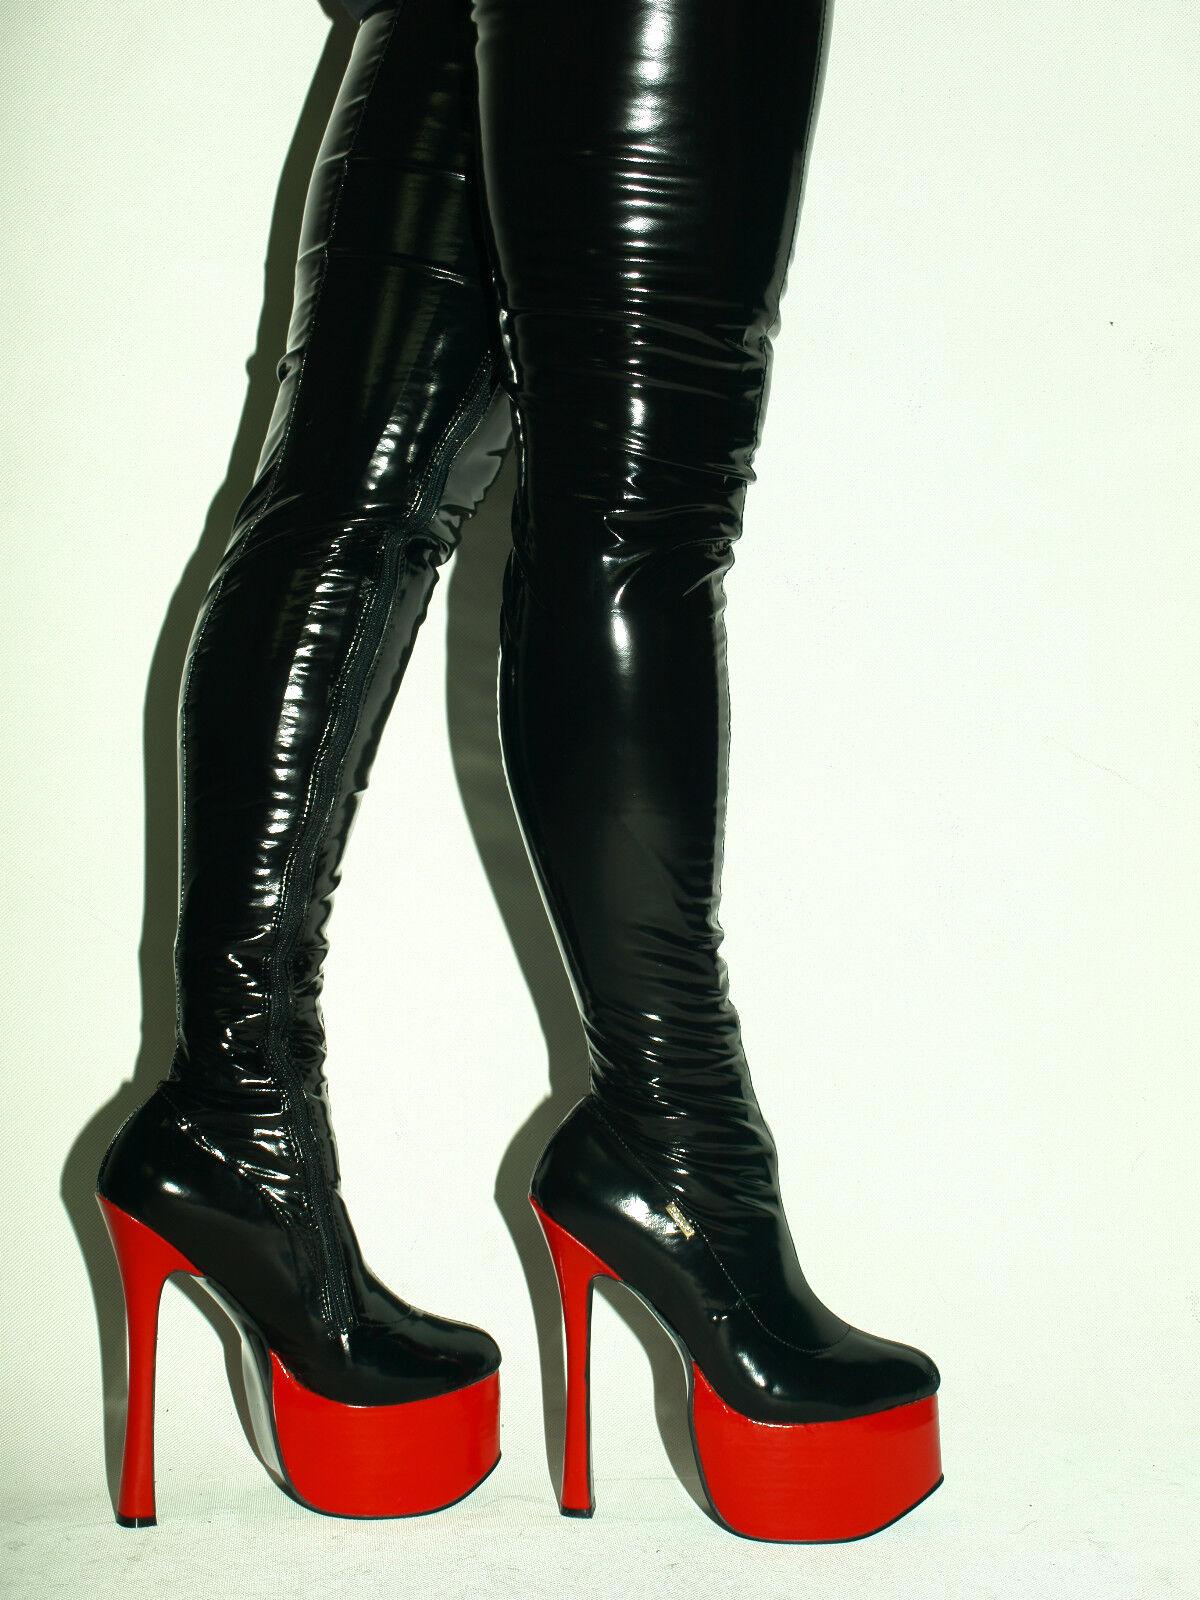 Promoción  fetiche de goma de látex botas talla talla talla 4-12 Tacos Plataforma 8 cm 20 cm Polonia  Venta en línea de descuento de fábrica